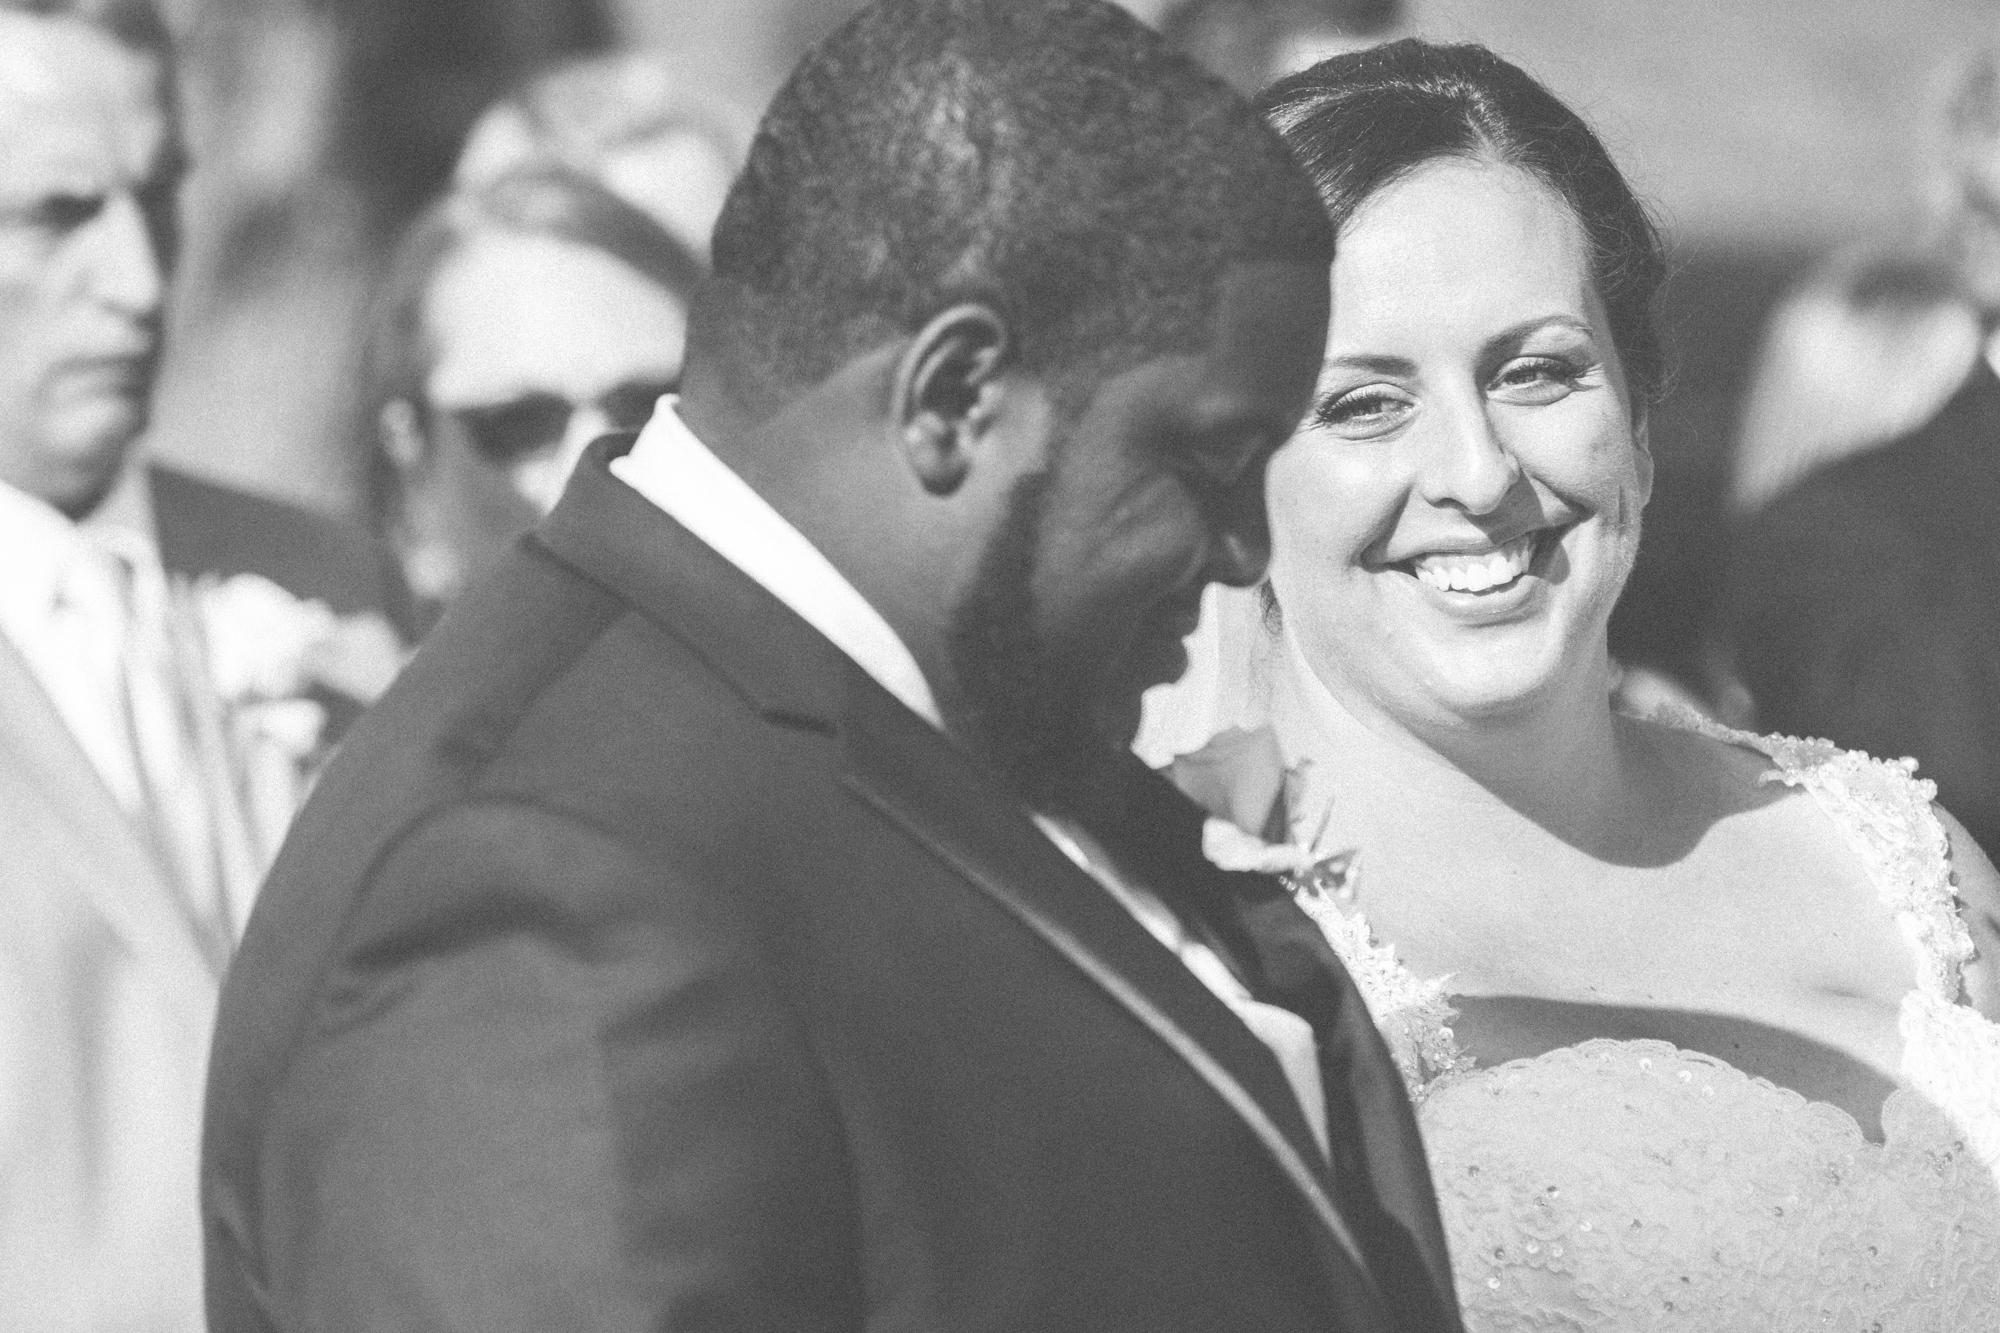 bride and groom at alter glen ellen farm